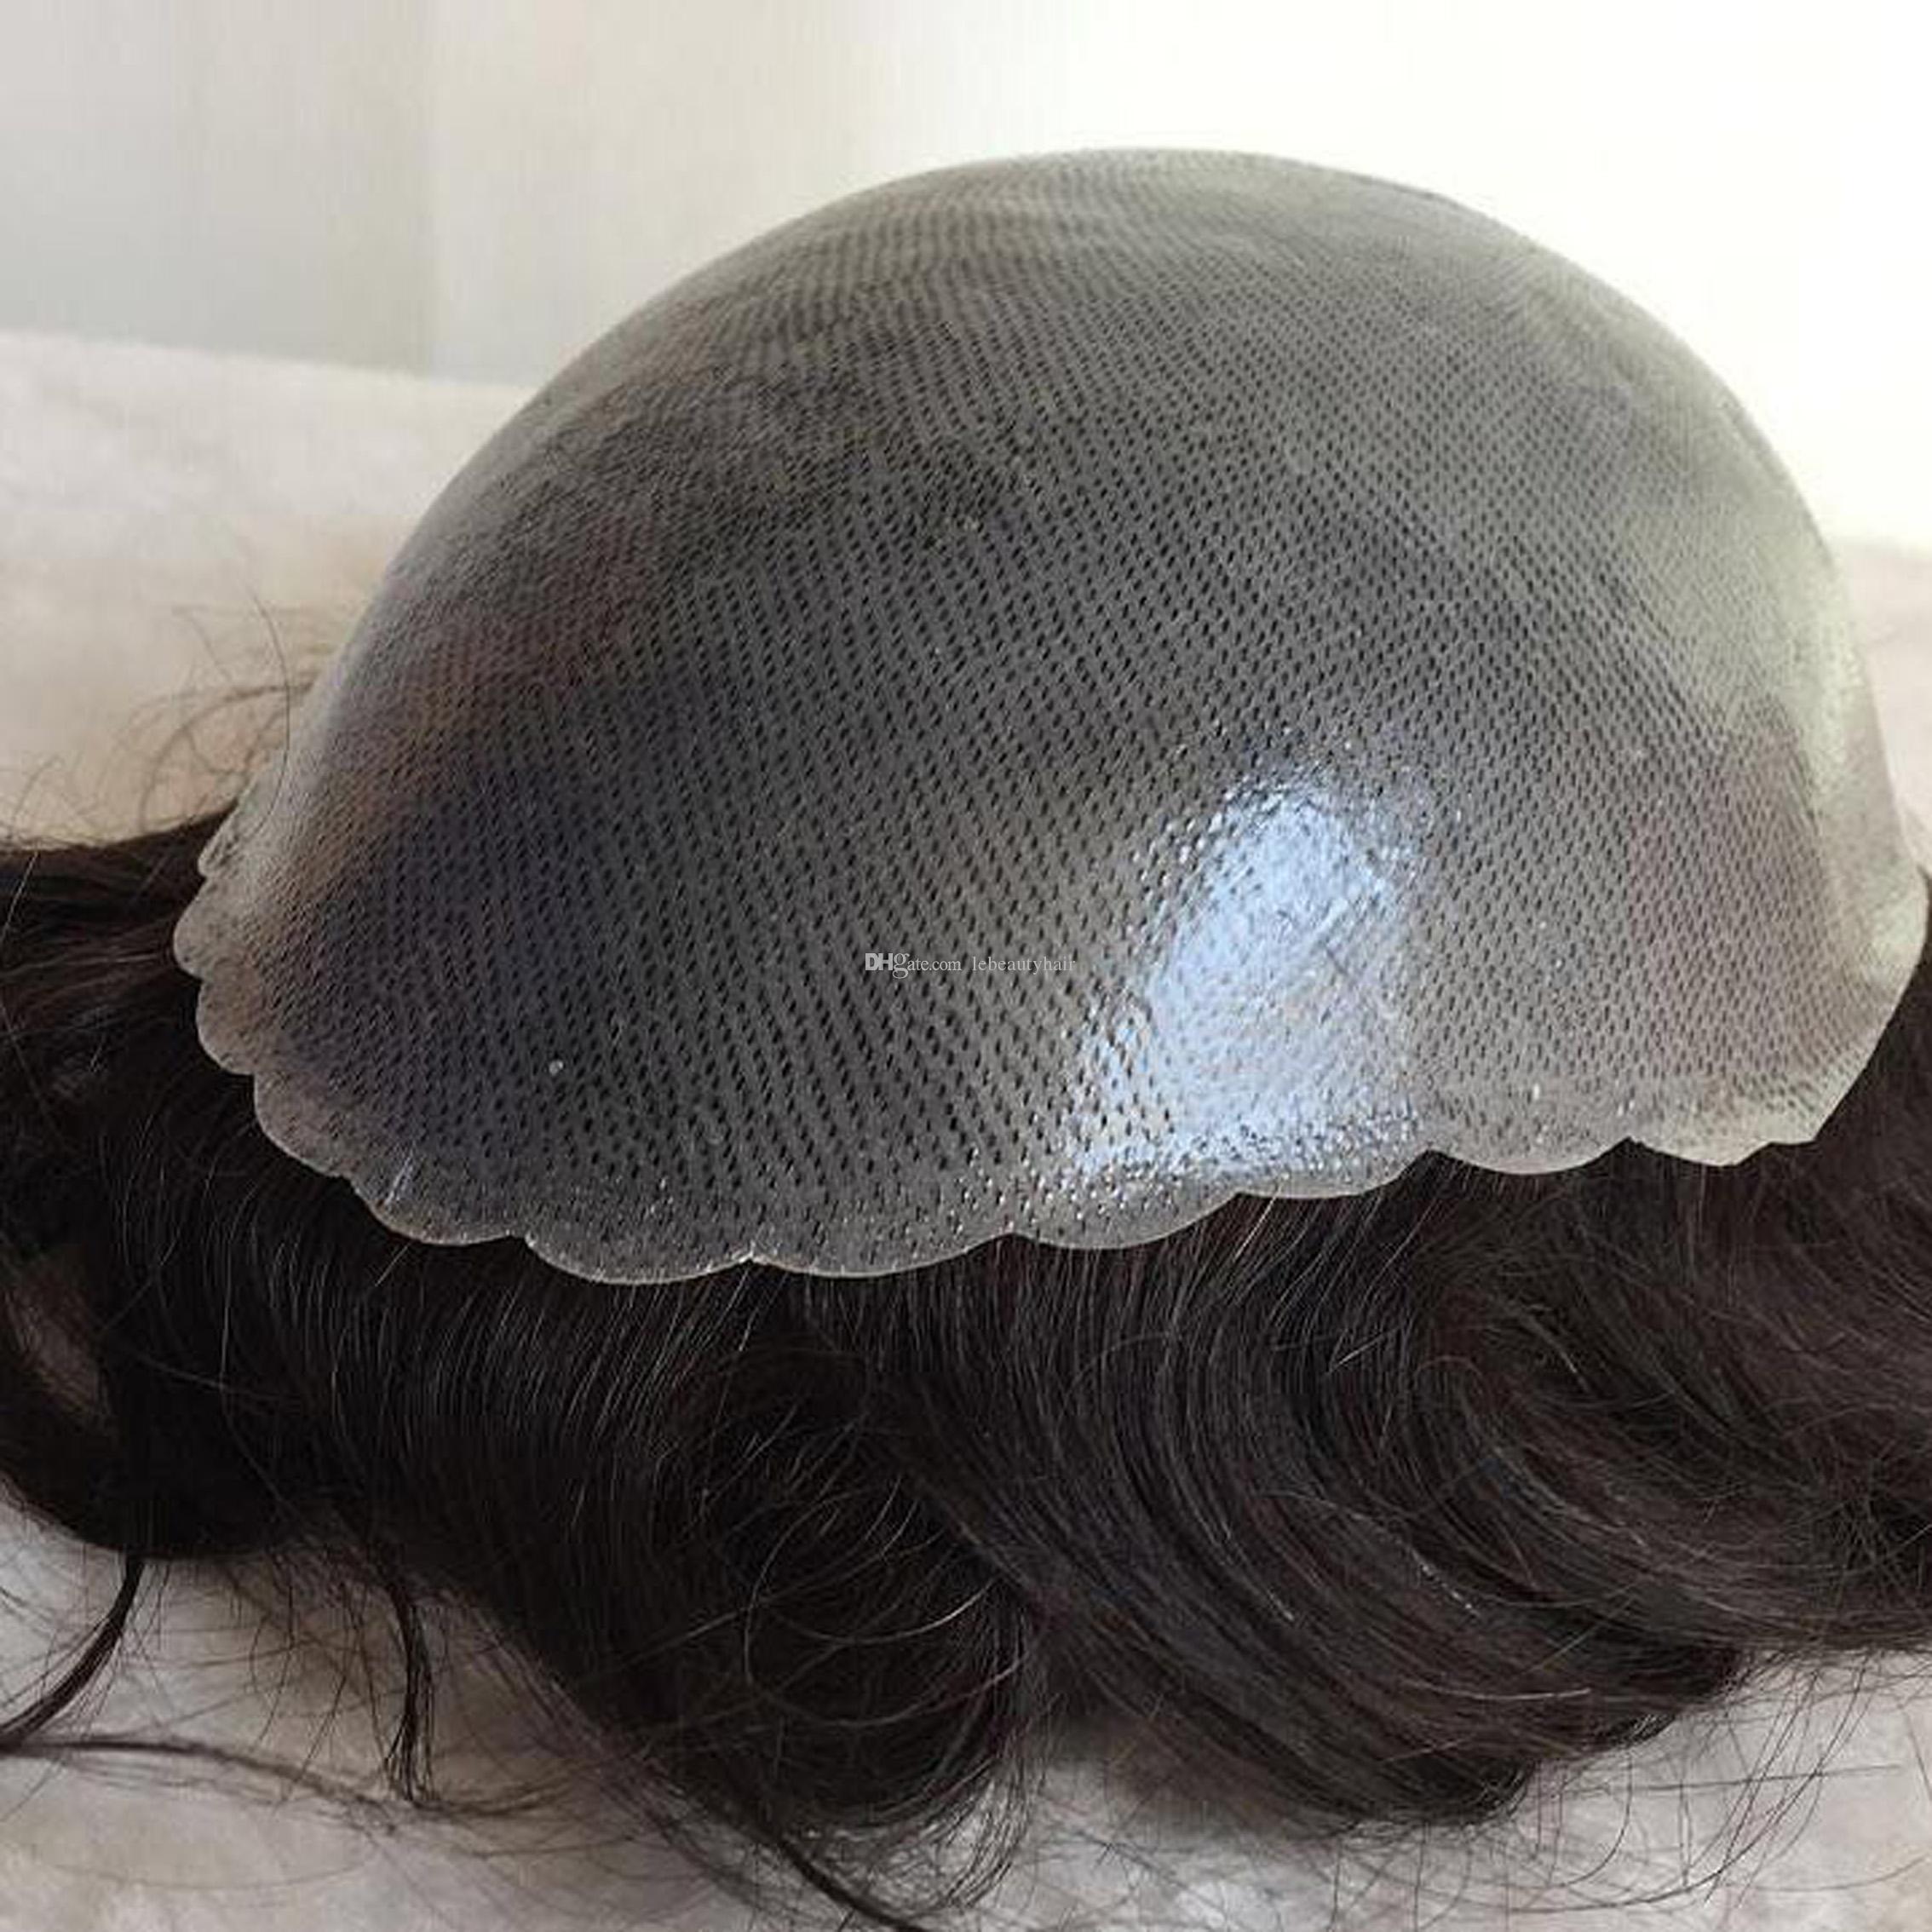 8x10 '' Pelo negro natural, piel fina, PU, 12-14 peluca, hombres, peluca, cabello humano